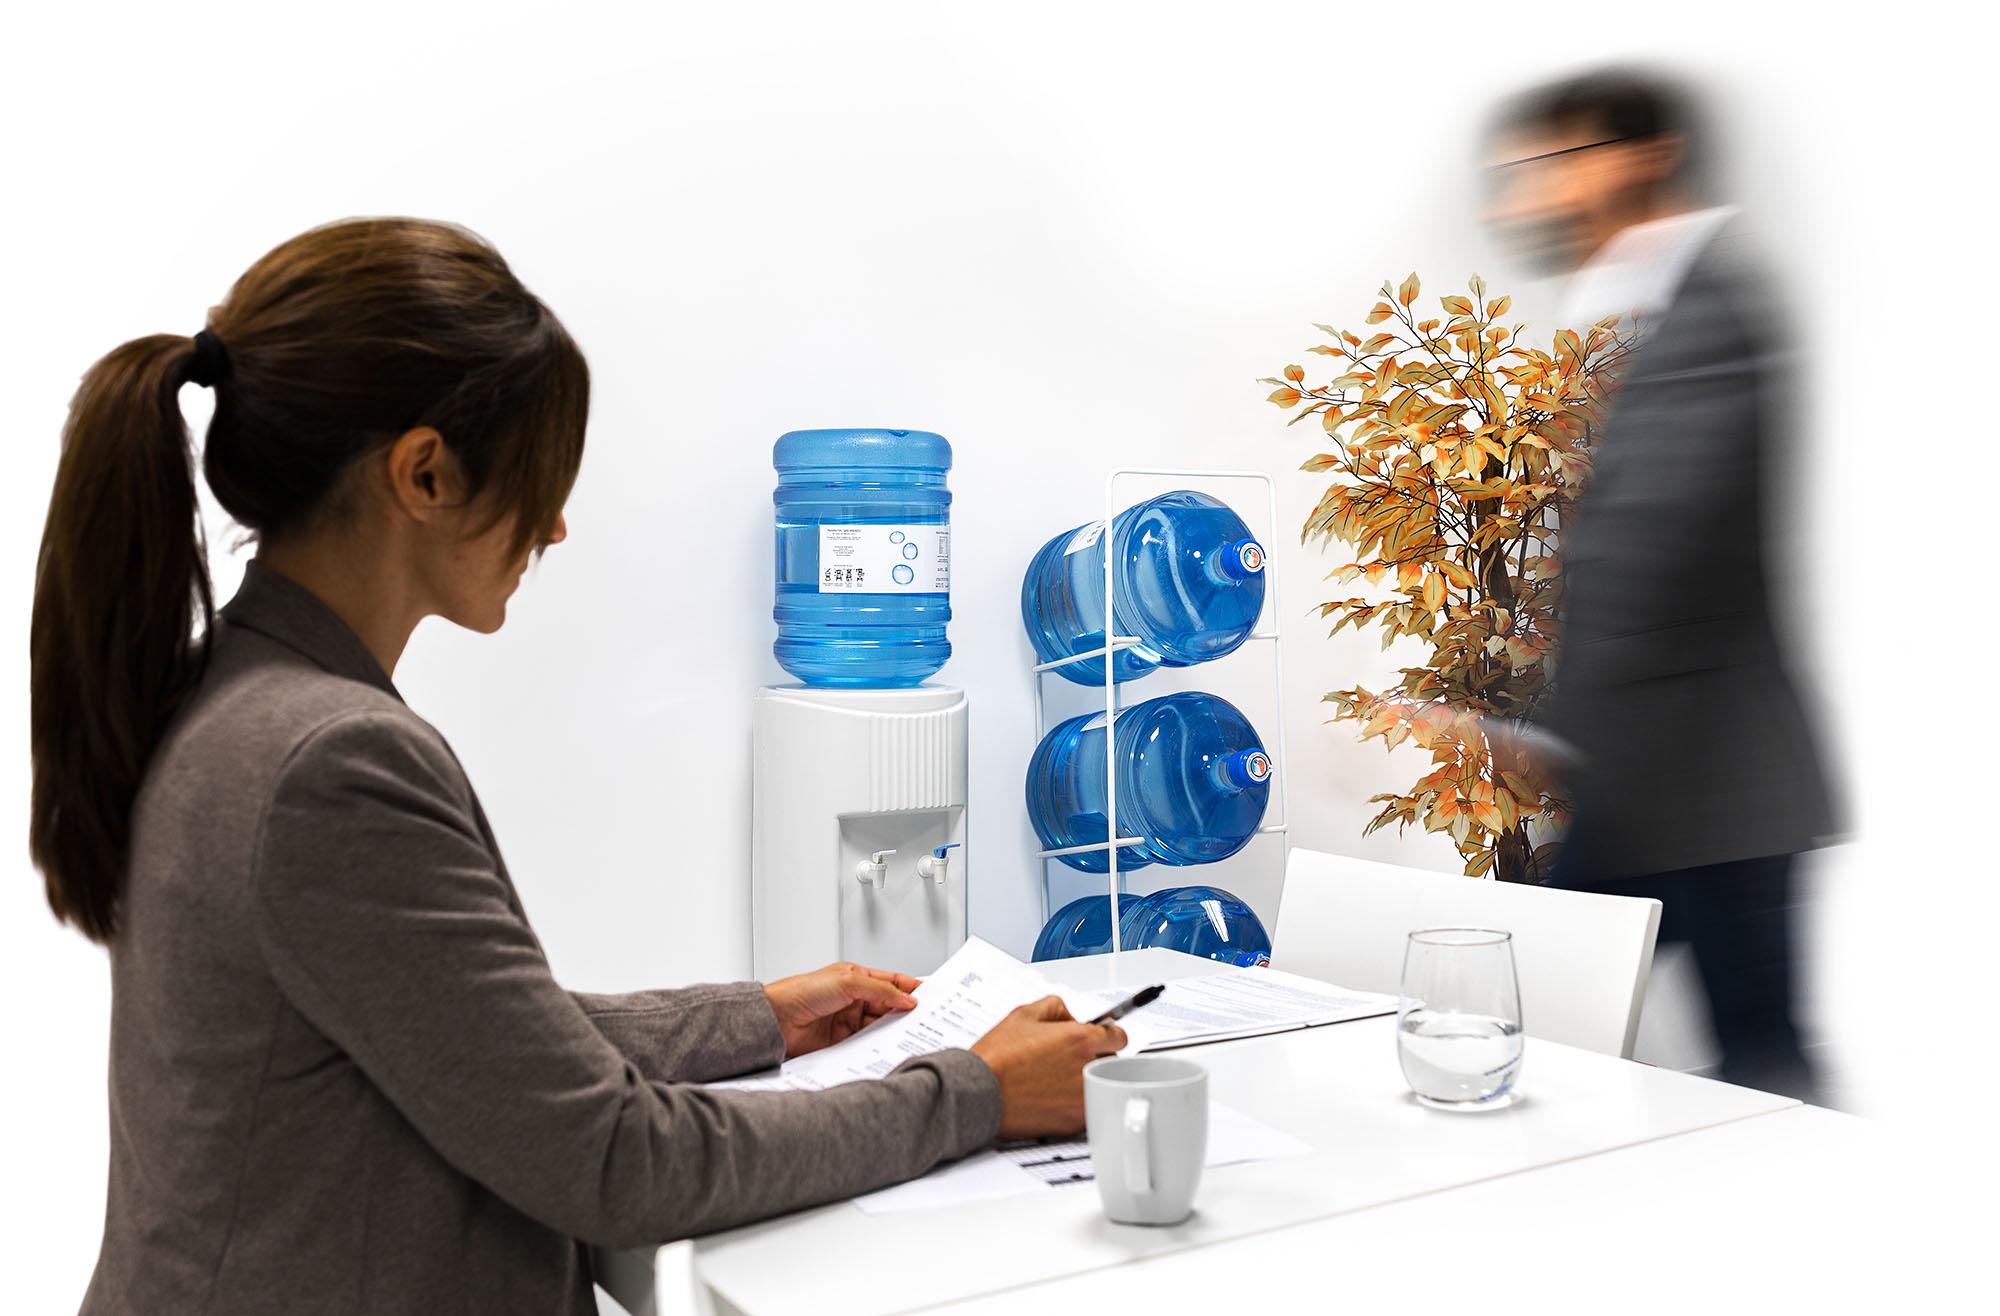 Dispensador de agua Burbujeo en la oficina